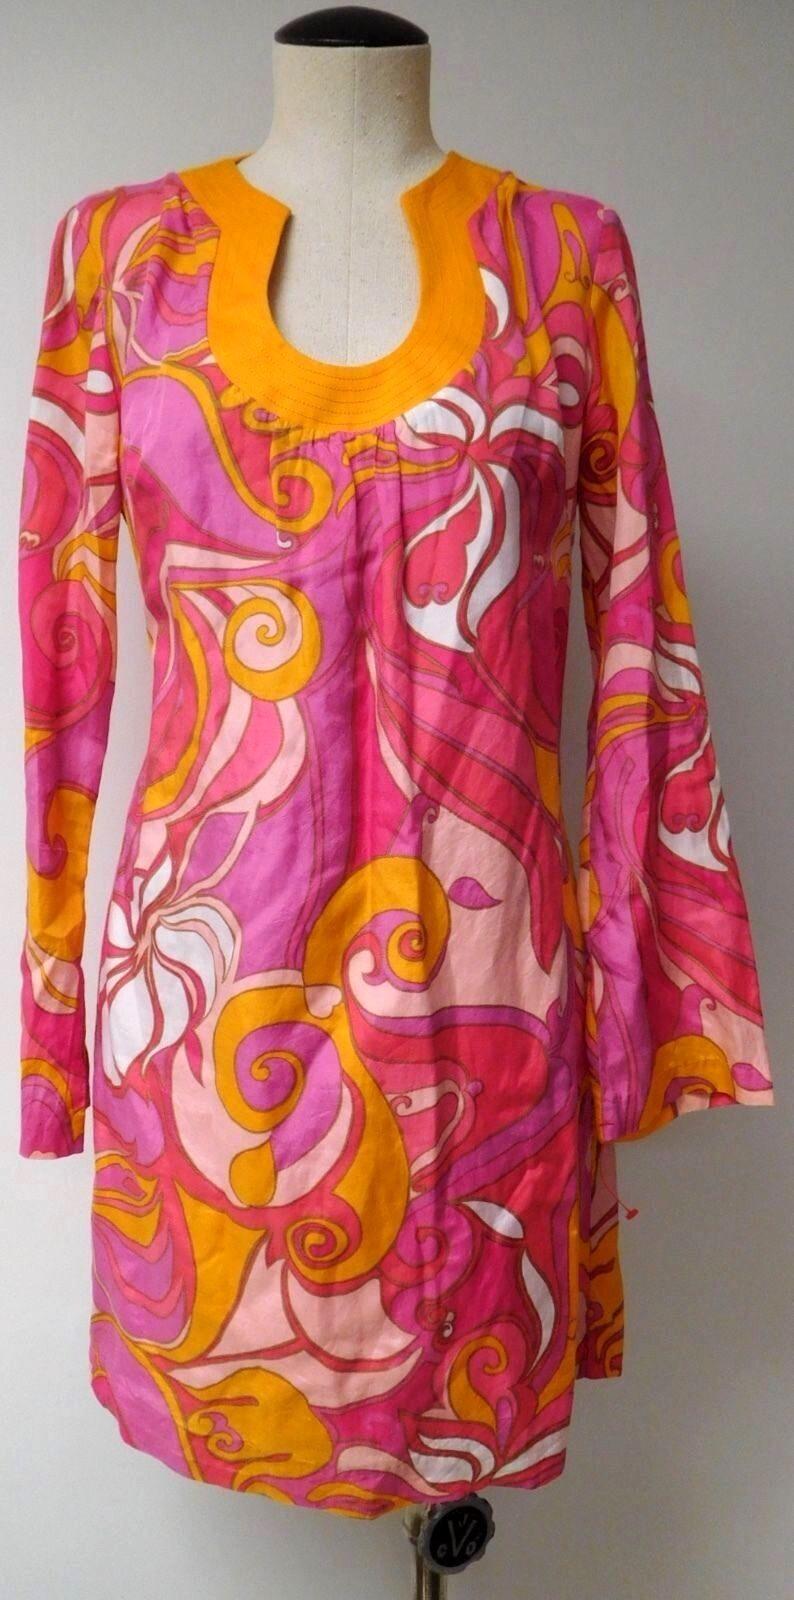 TRINA TURK COLLECTION FOR BANANA REPUBLIC SUMMER 2012 TUNIC DRESS SILK BLEND 4